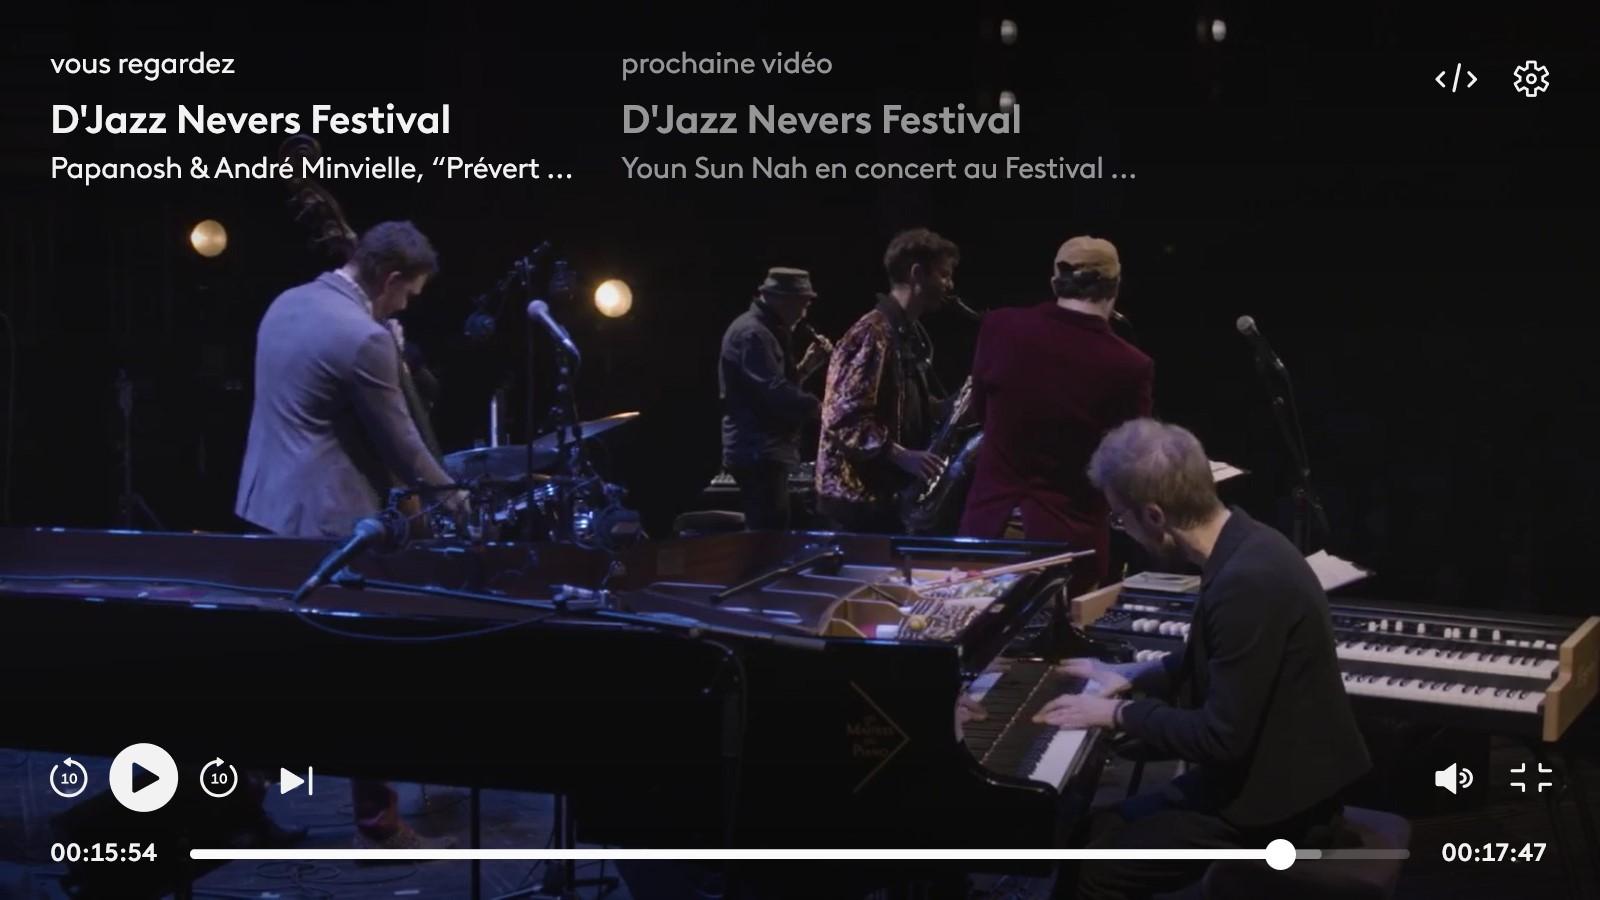 visuel concert live prevert parade